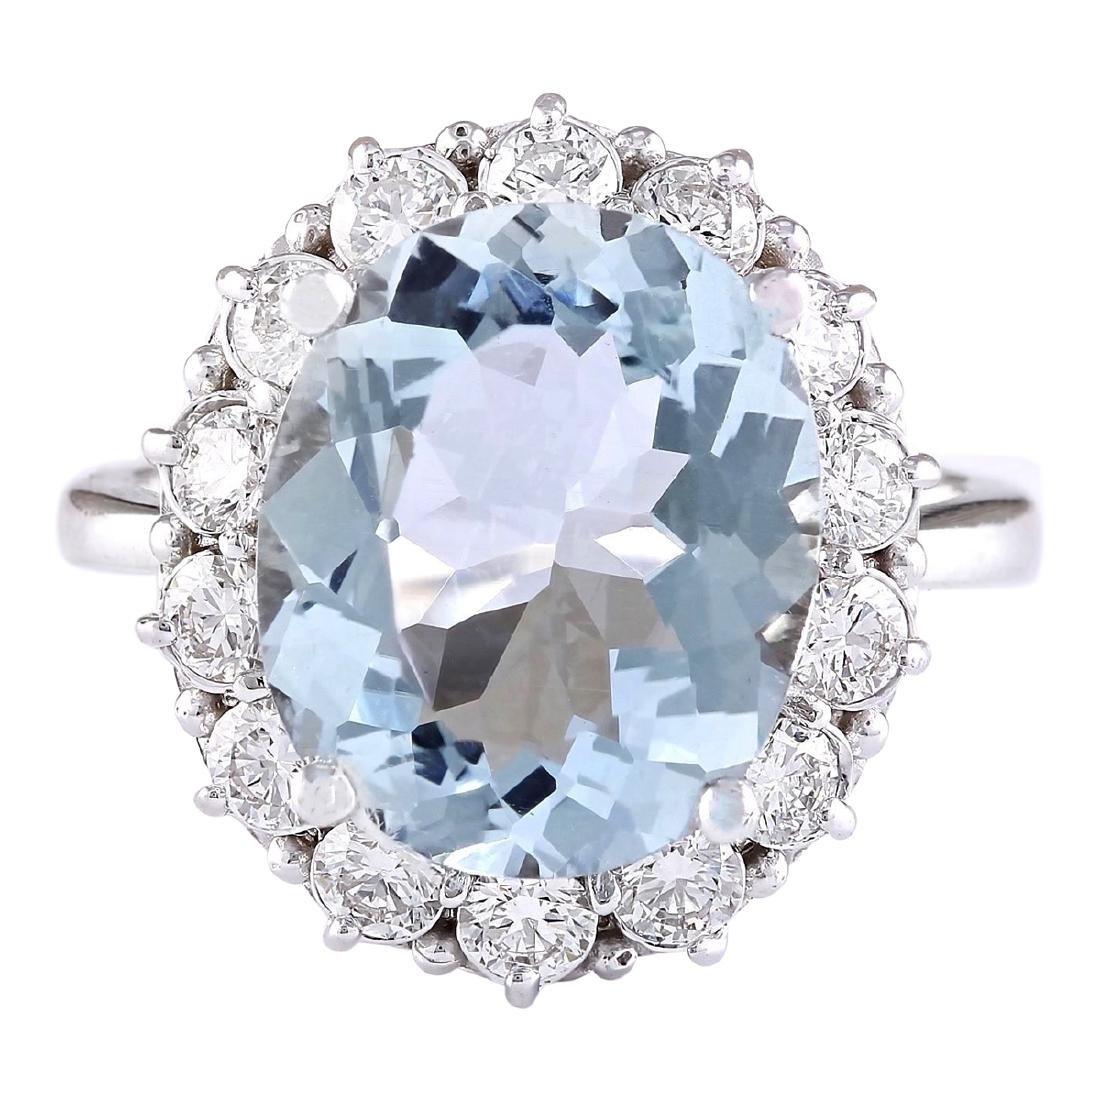 7.01 CTW Natural Aquamarine And Diamond Ring In 18K